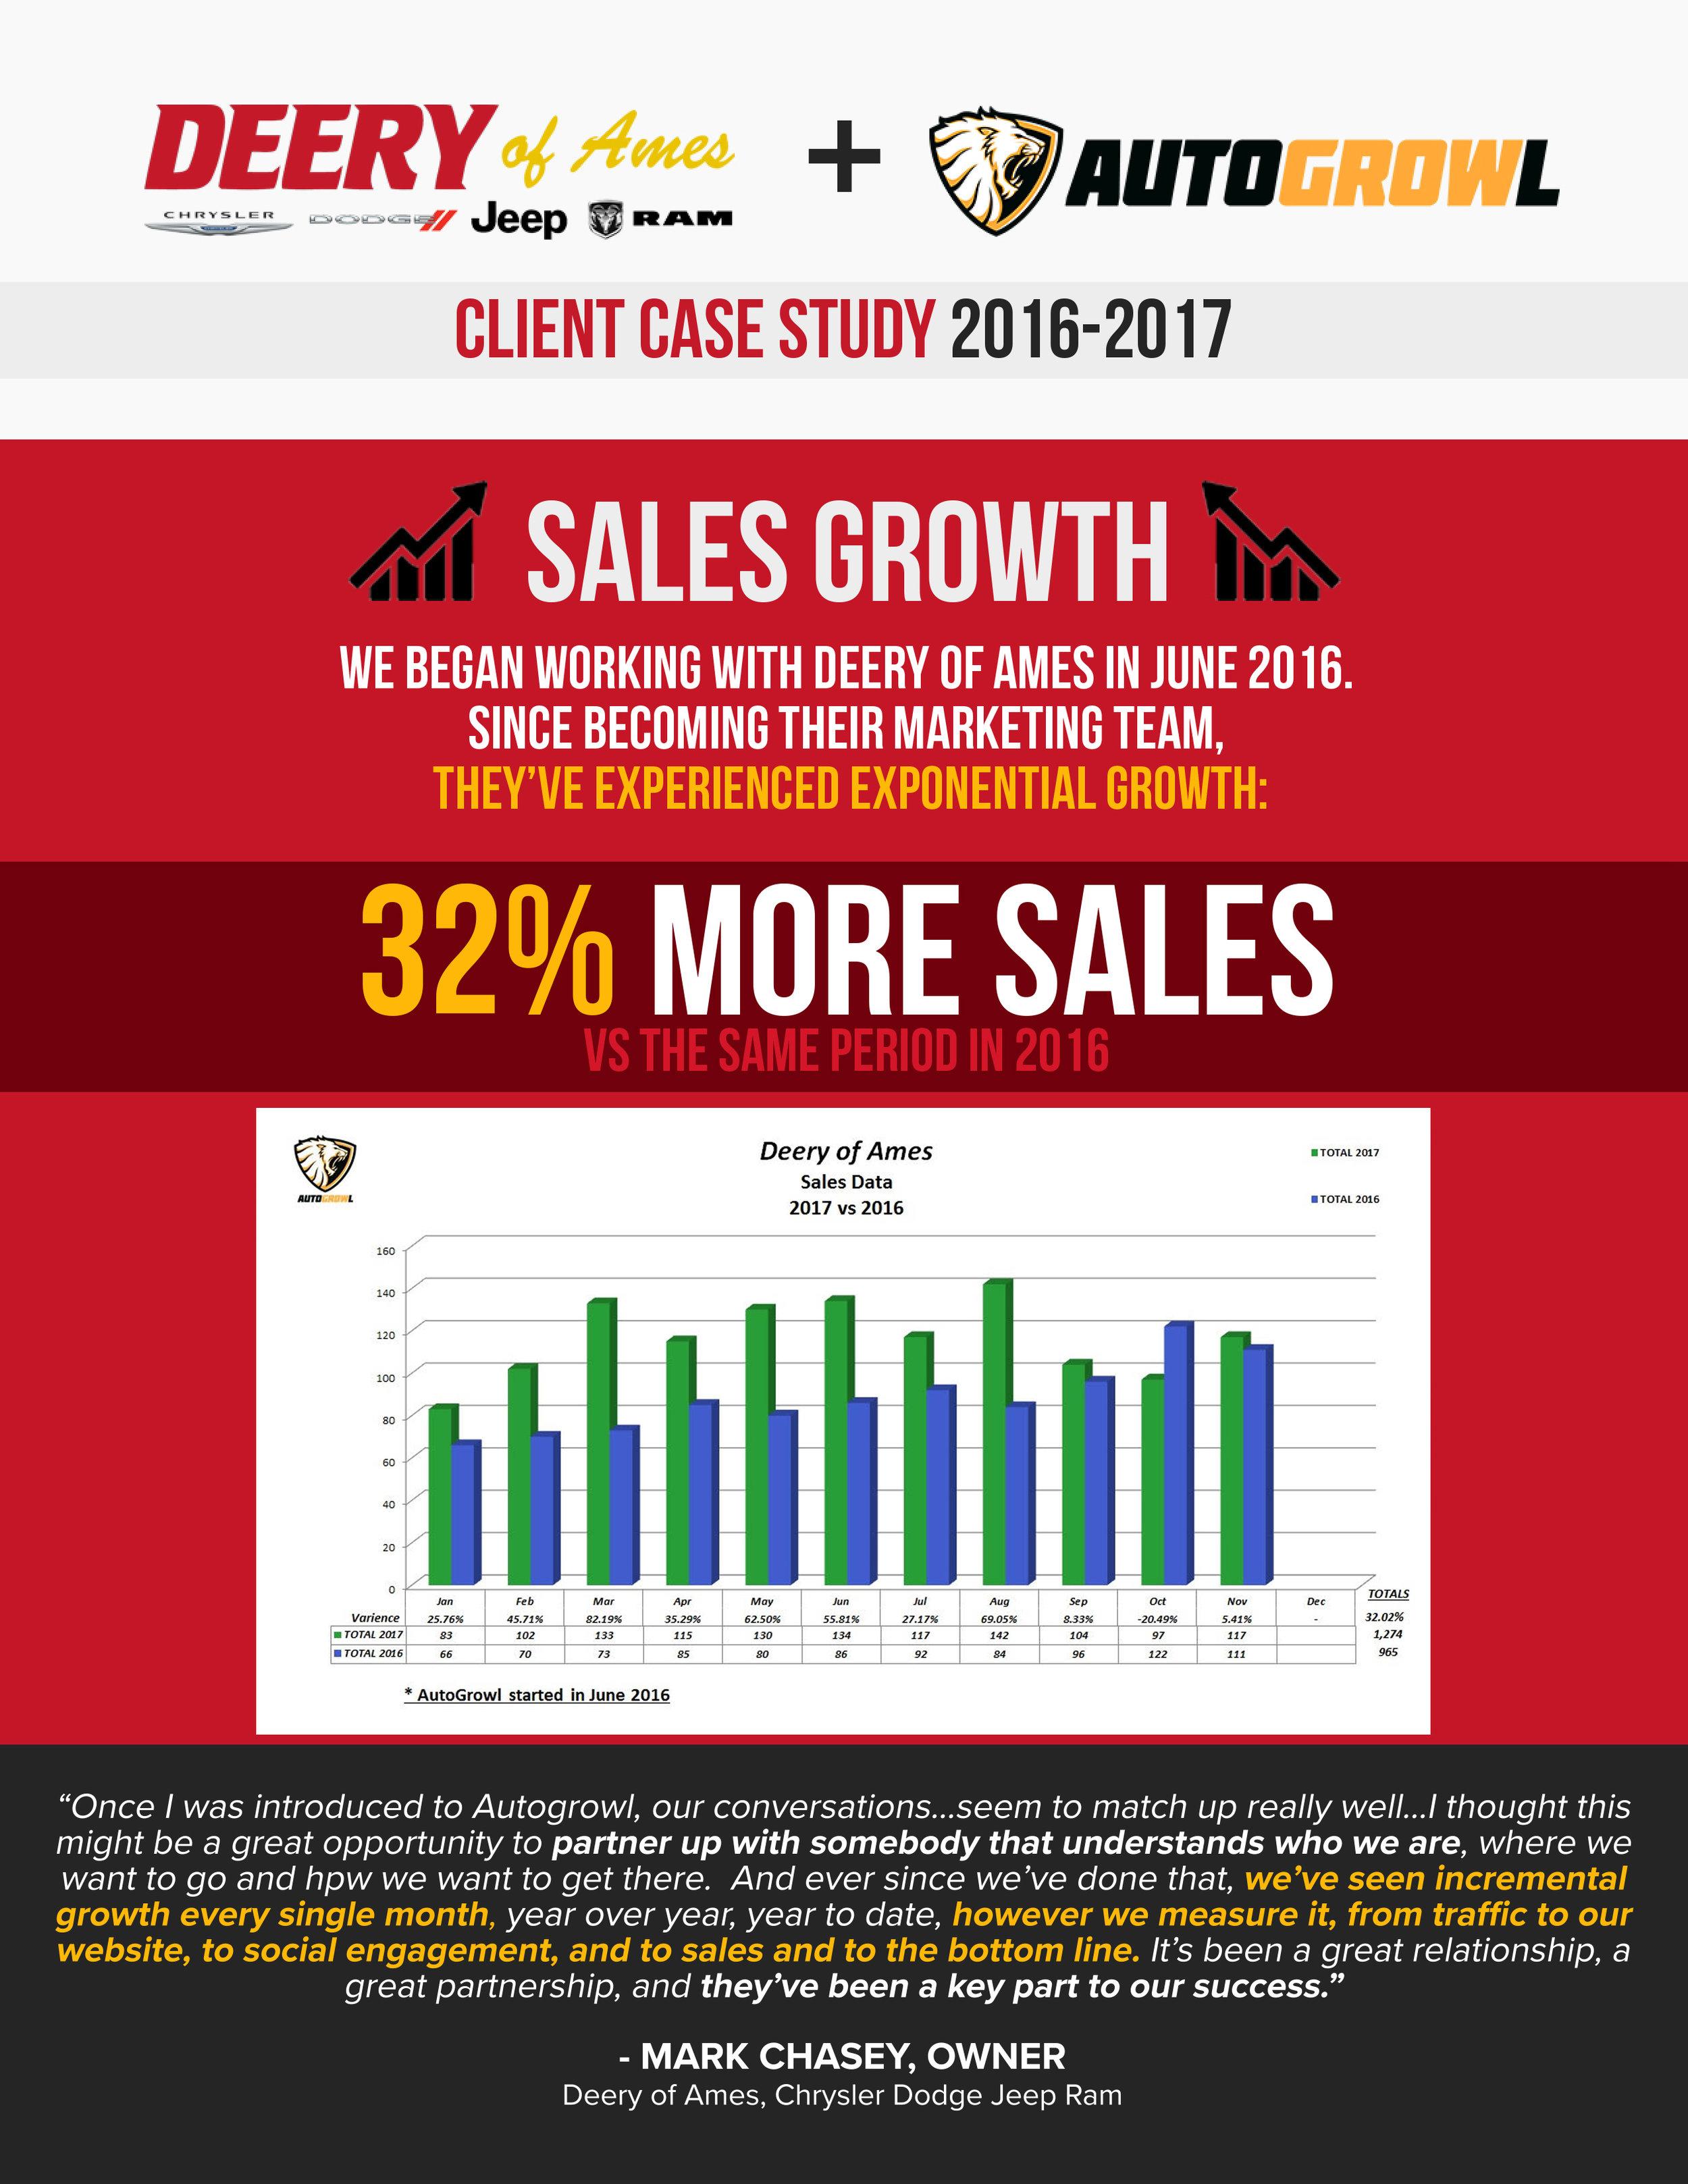 Autogrowl_DeeryAmesCaseStudy_Sales.jpg